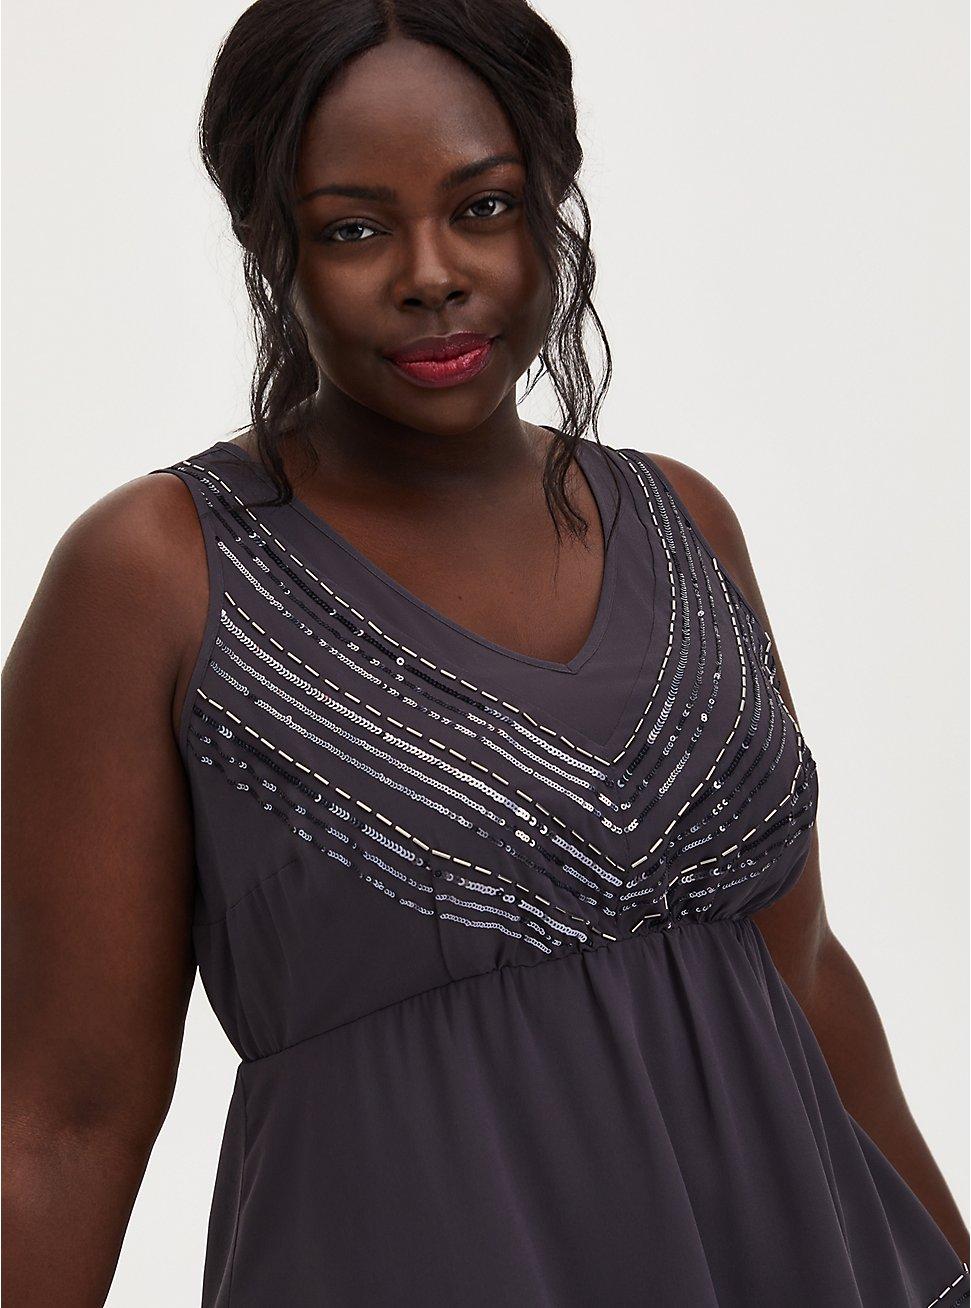 Dark Slate Grey Chiffon Embellished Stripe Peplum Top, NINE IRON, hi-res